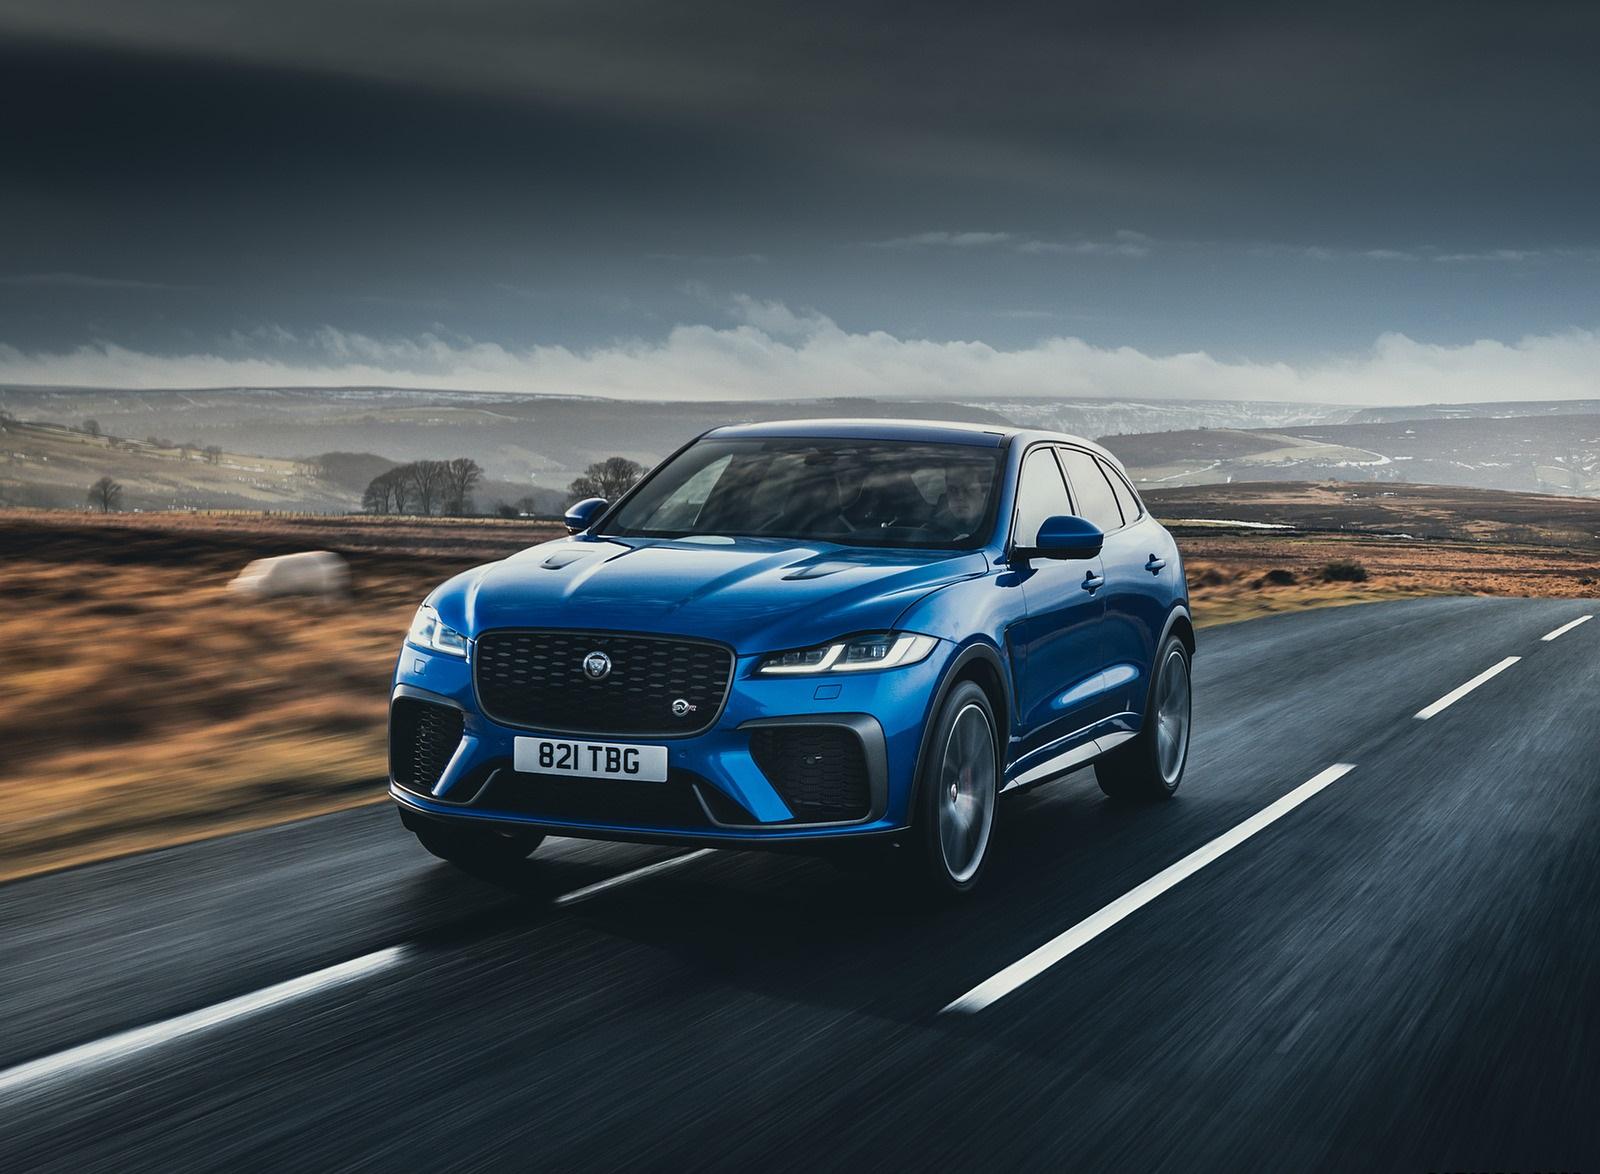 2021 Jaguar F-PACE SVR (Color: Velocity Blue) Front Three-Quarter Wallpapers  (1)